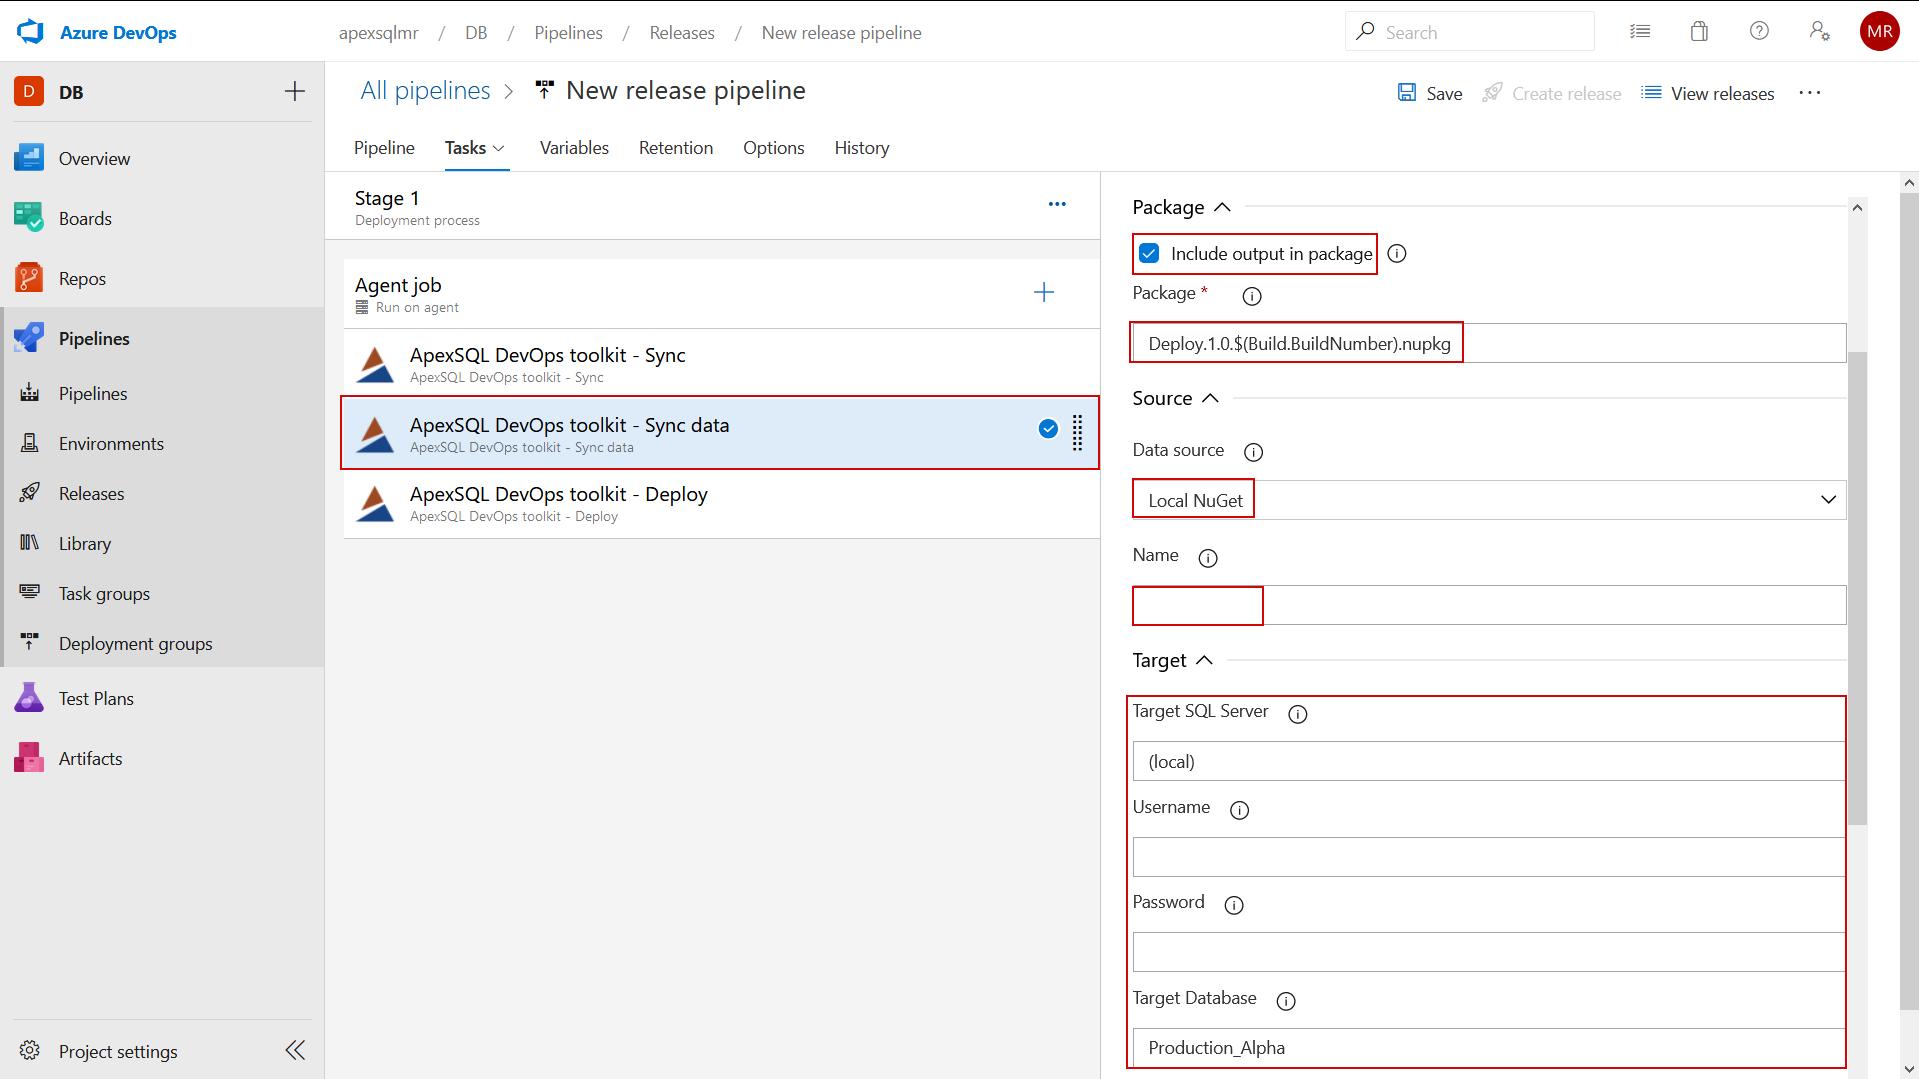 ApexSQL DevOps toolkit - Sync data task configuration